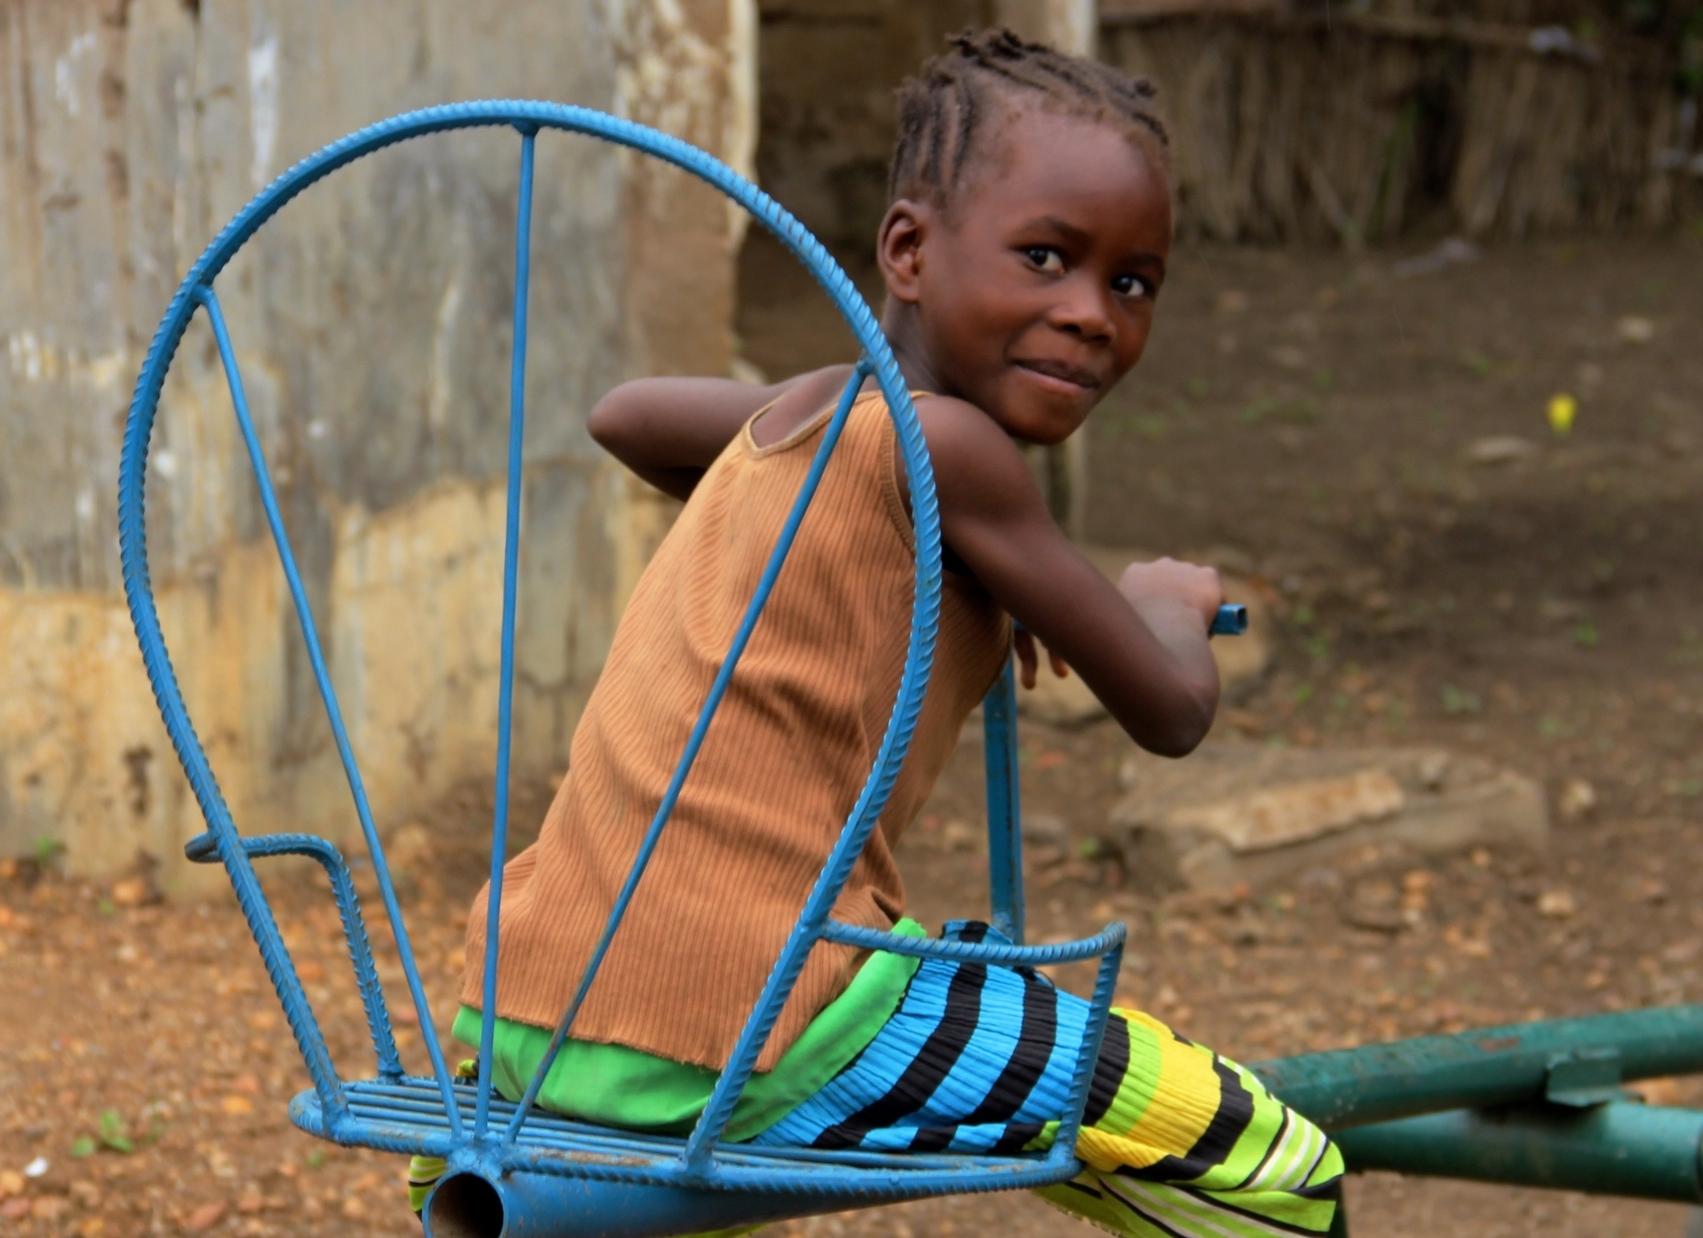 Young girl enjoys seesaw in Kenya.